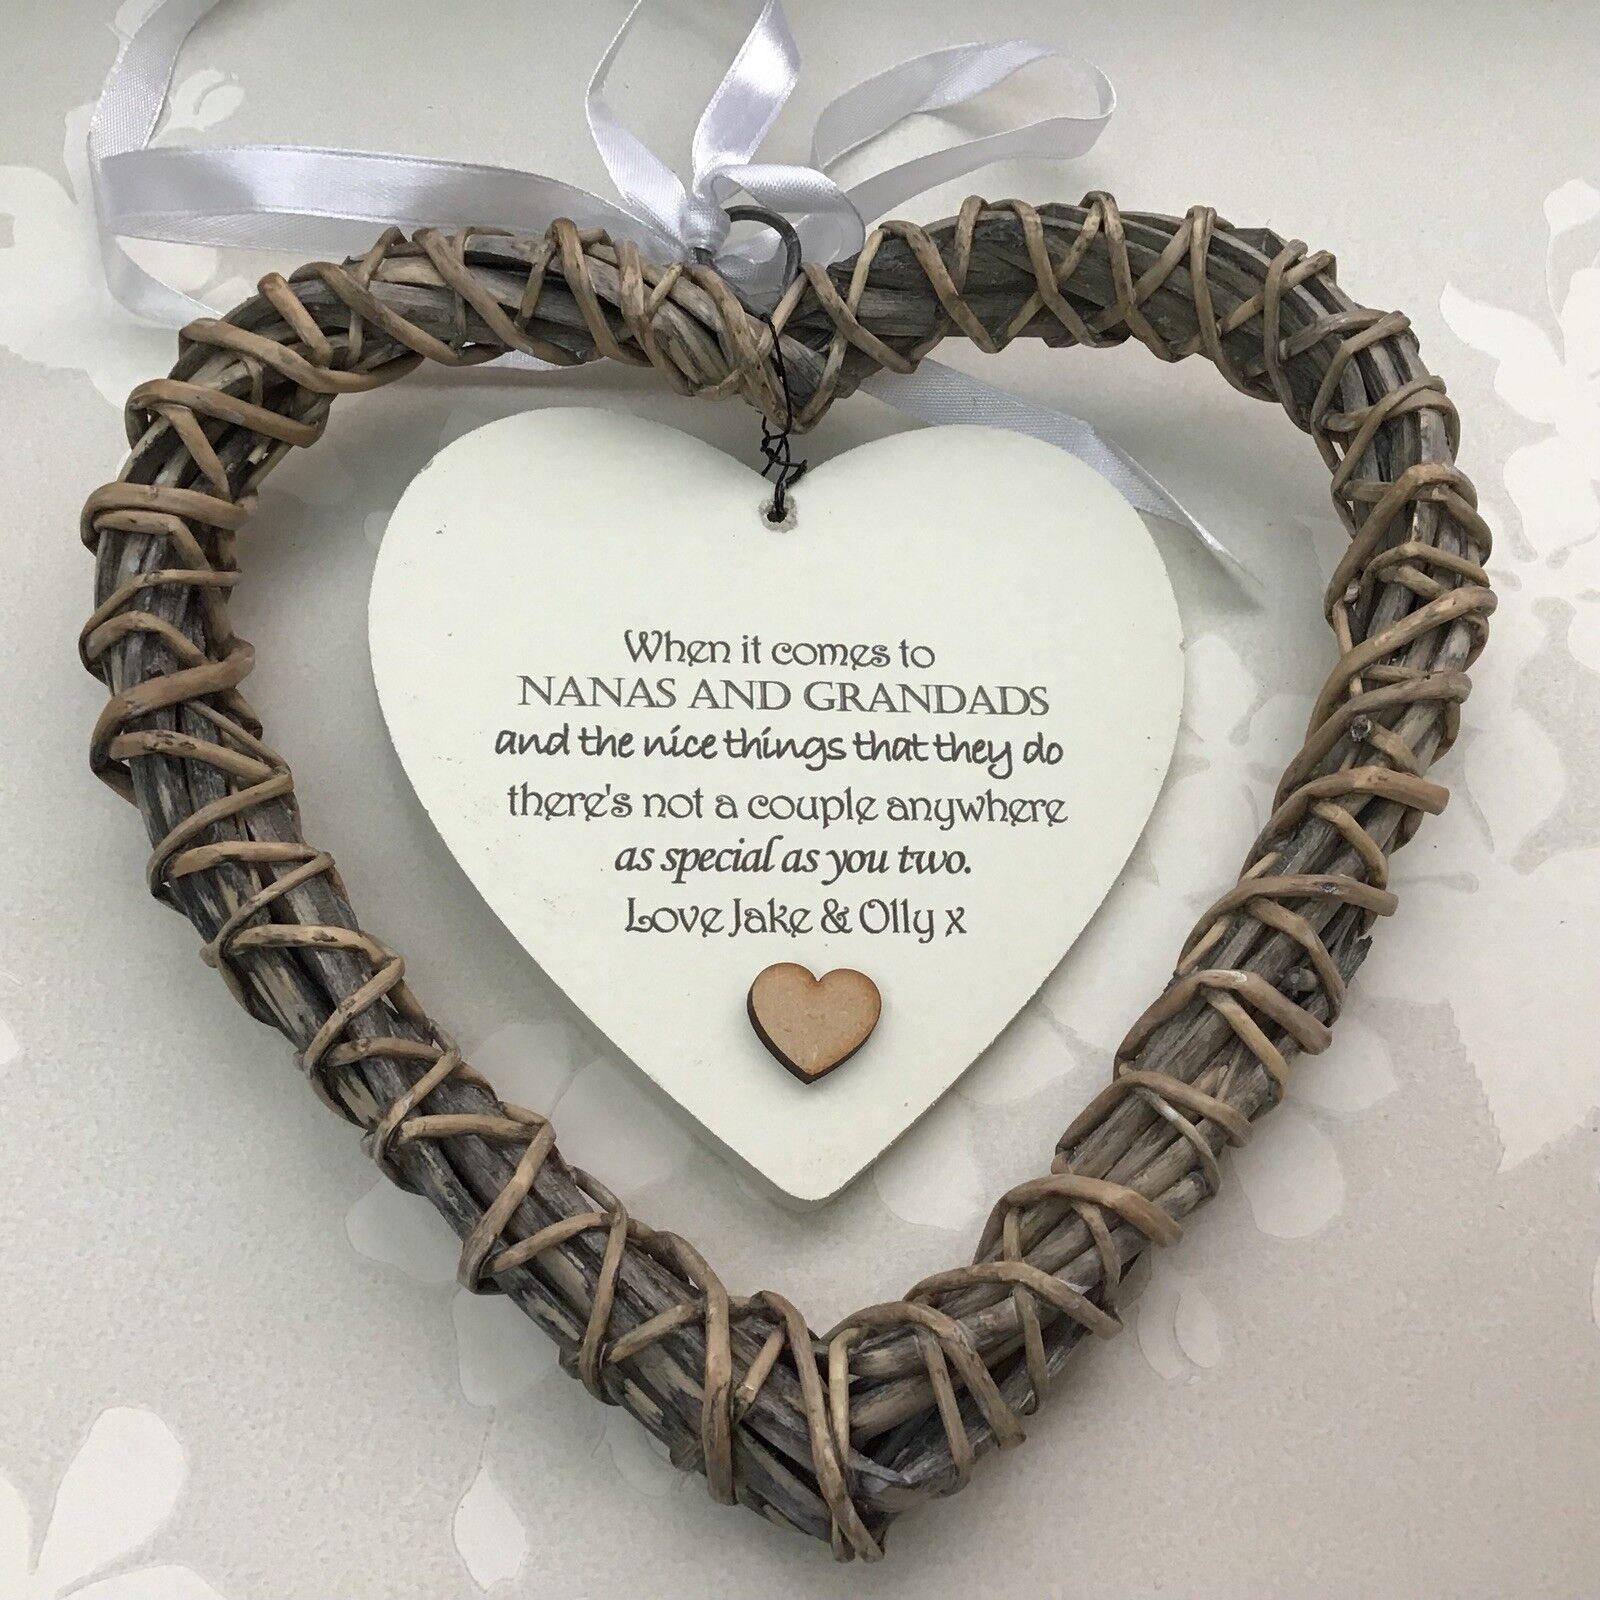 Shabby personalised Chic NANA Nanny NANNIE Grandad ~ ANY NAMES Gift Willow Heart